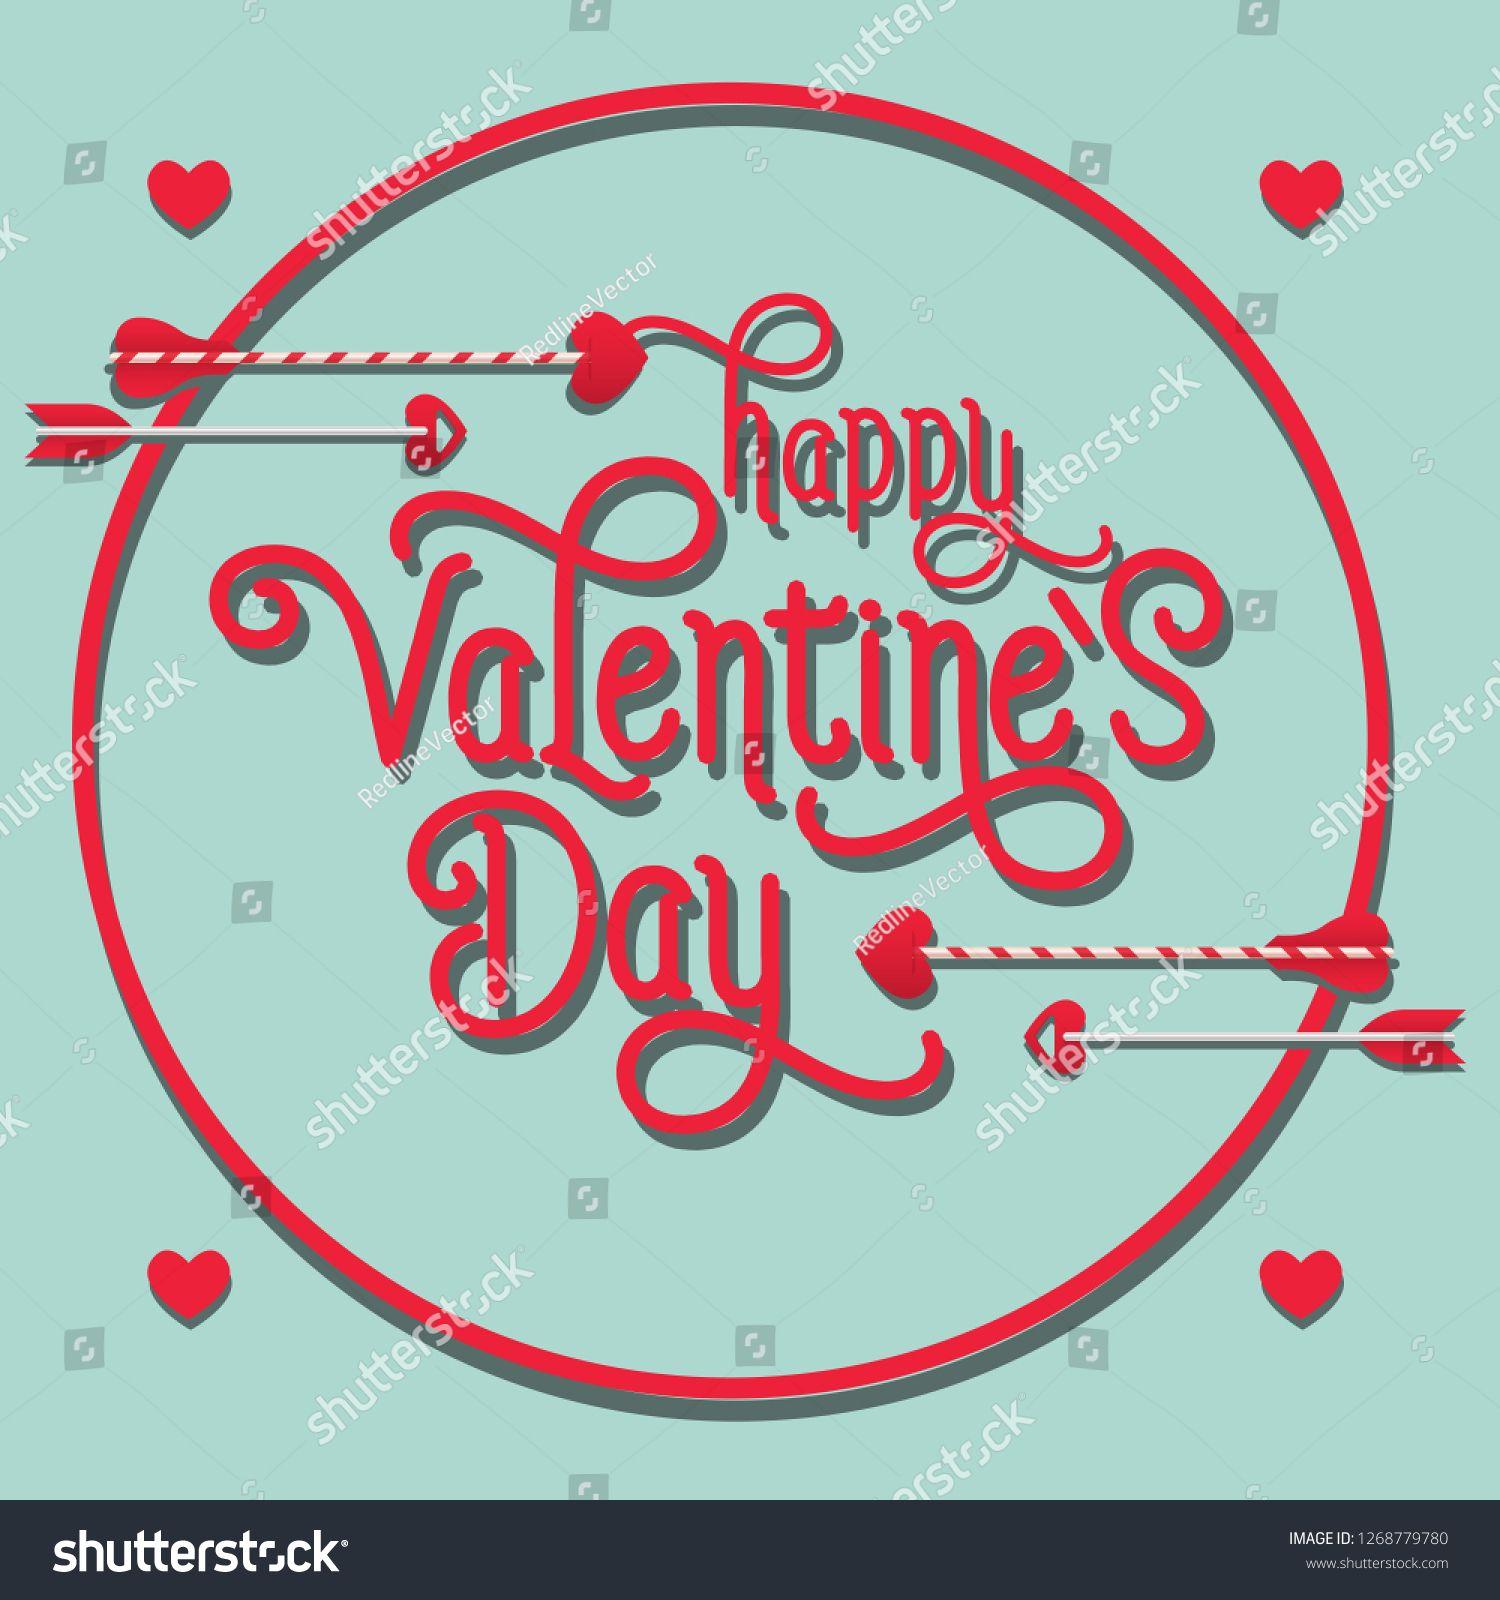 Happy Valentines Day Lettering In Round Frame With Arrows Saint Valentines Day Greetin Valentine S Day Greeting Cards Valentines Day Greetings Saint Valentine